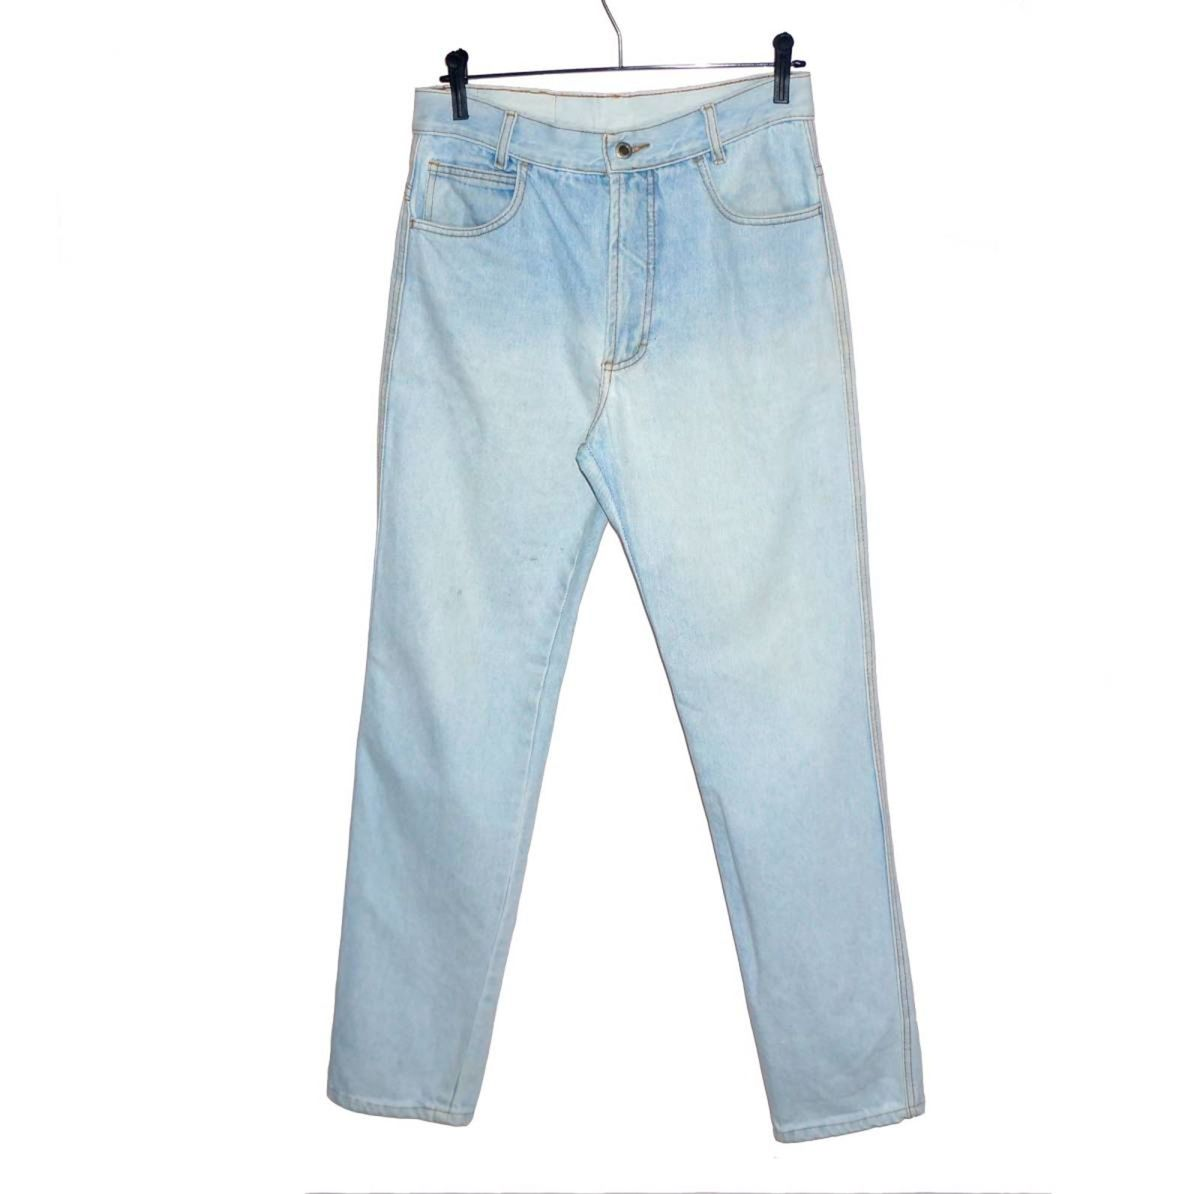 be011dce1264 calça jeans vintage cintura alta mom jeans unisex seminova - calças hamuche